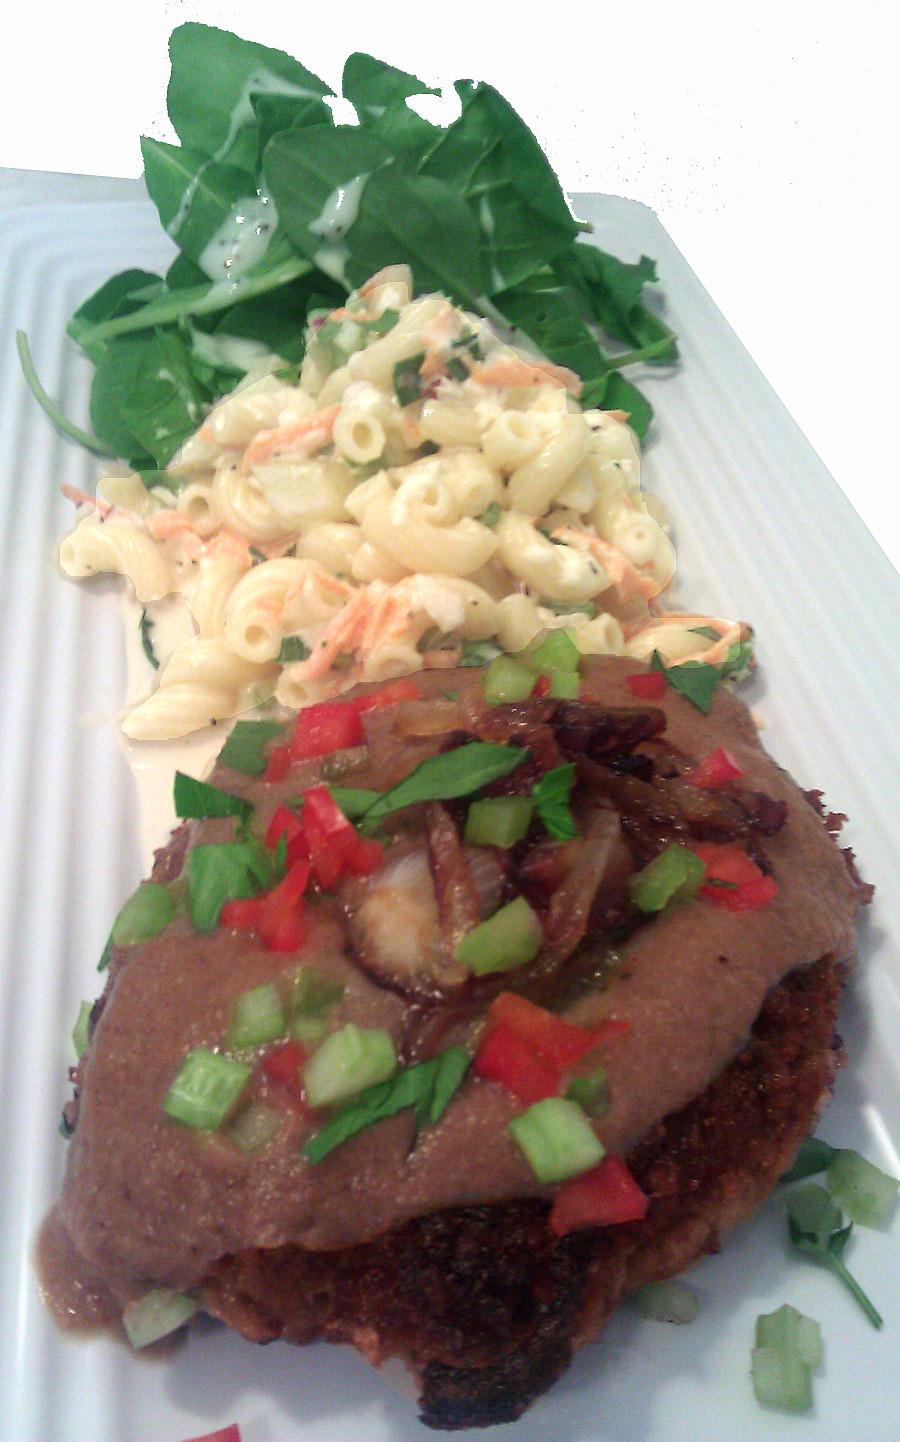 Caramelized Onion And Beef Loco Moco Recipe — Dishmaps